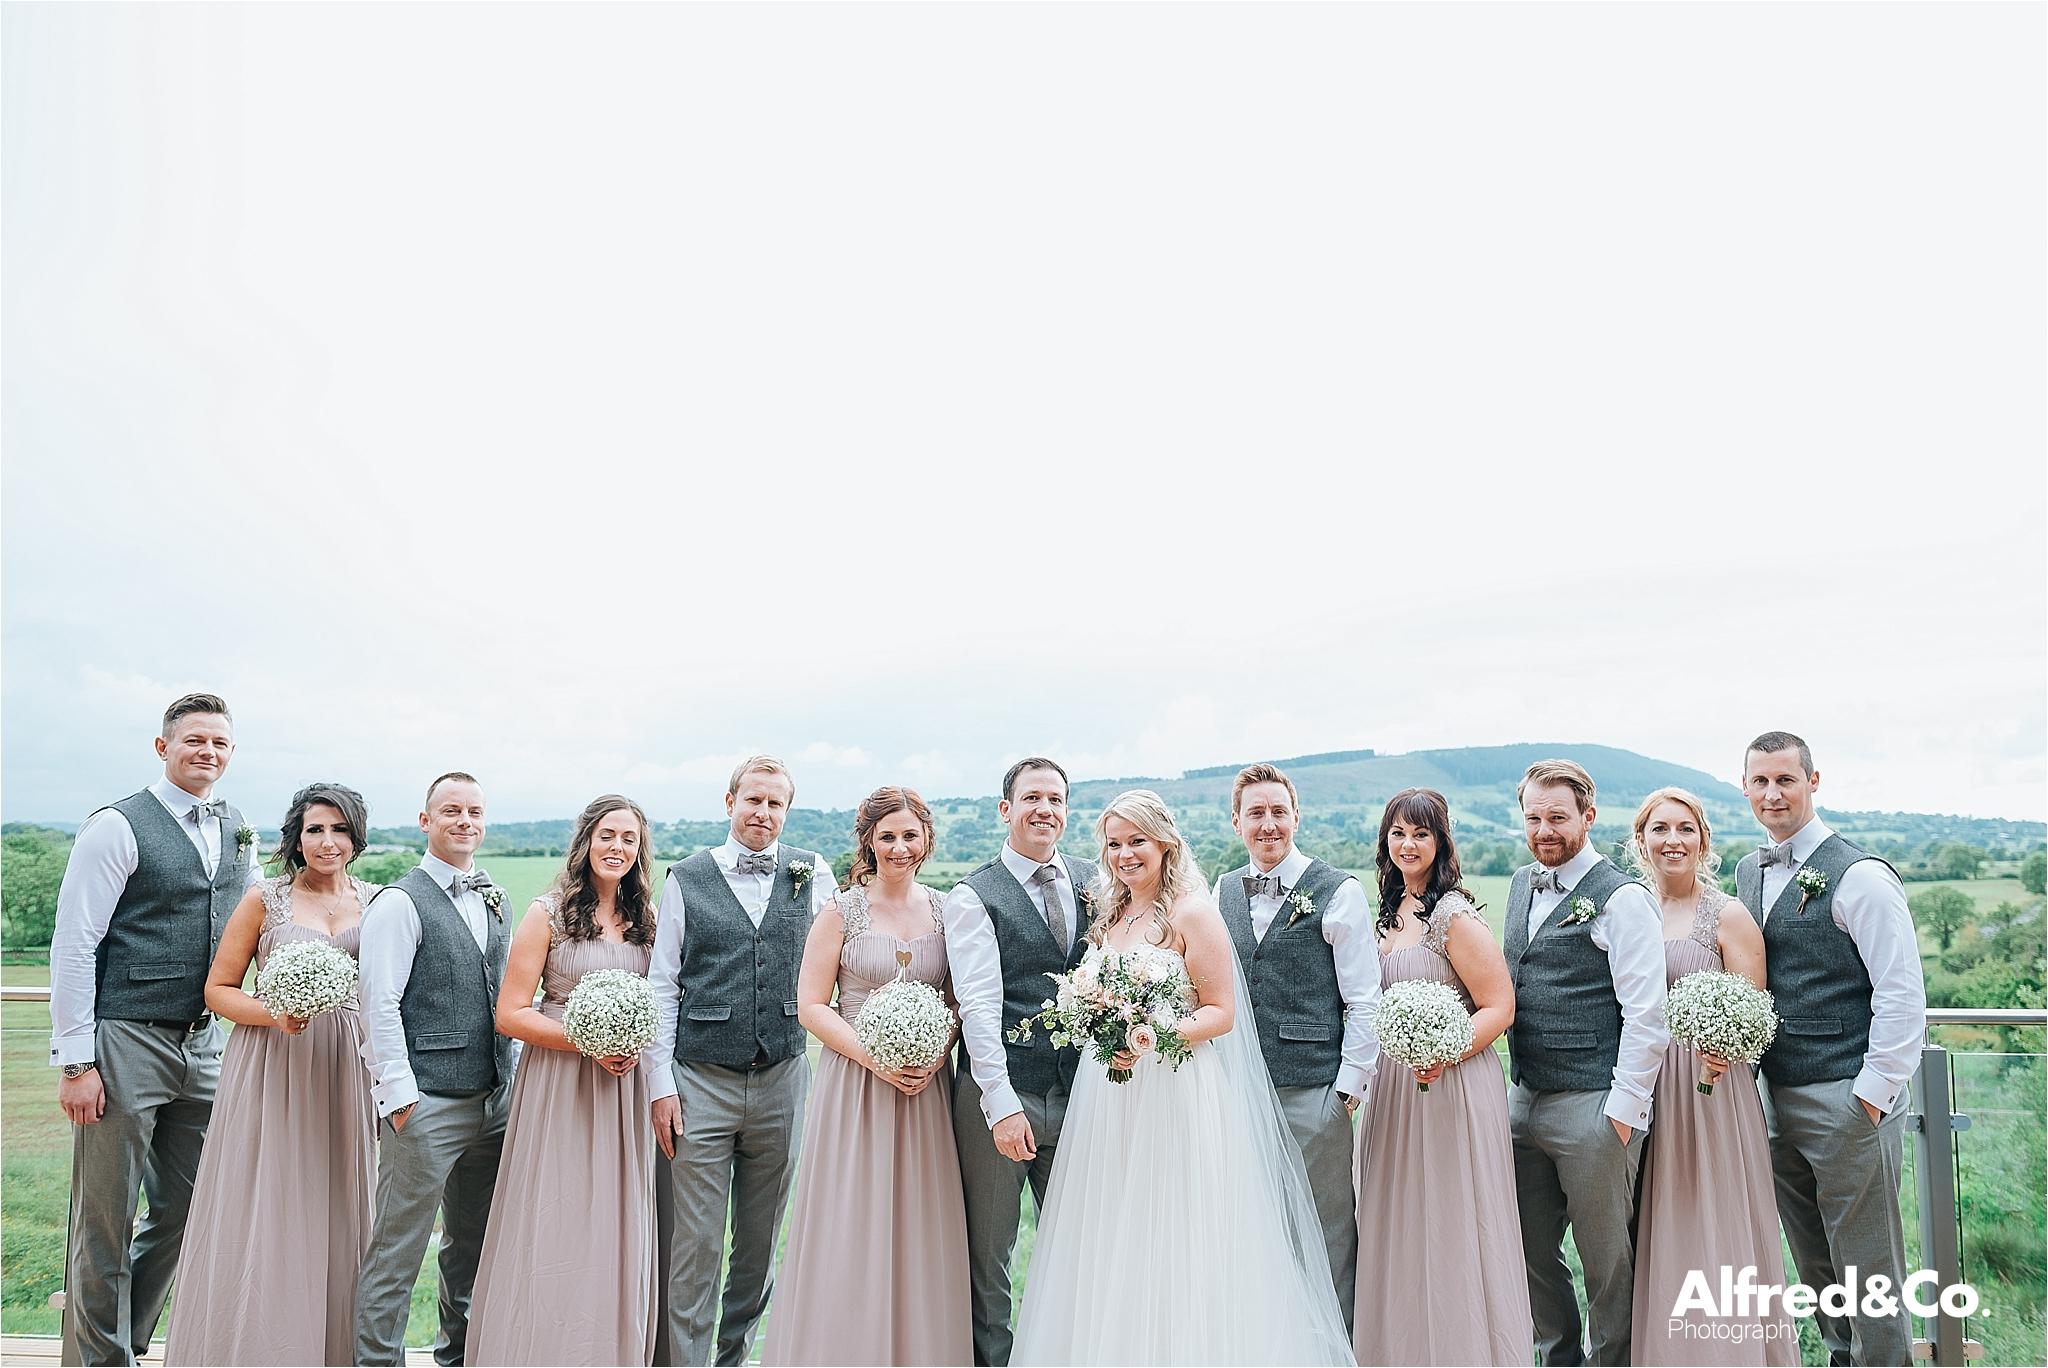 bashall barn wedding photographer, lancashire